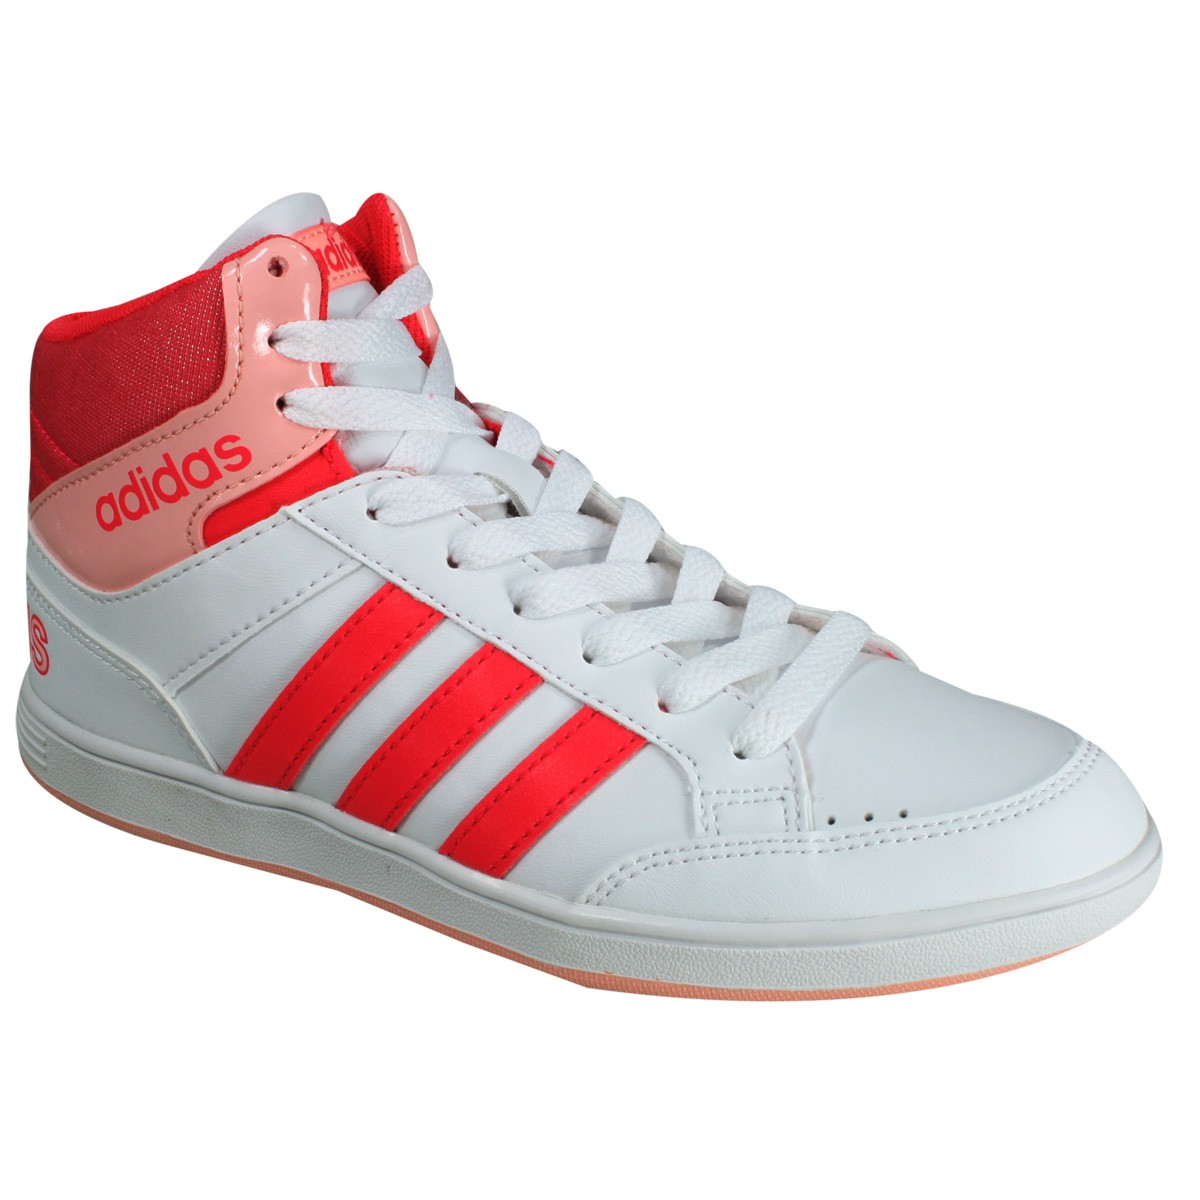 e381434d04d Tênis Adidas Hoops Mid K Botinha B74653 - Branco Rosa - Botas Online ...